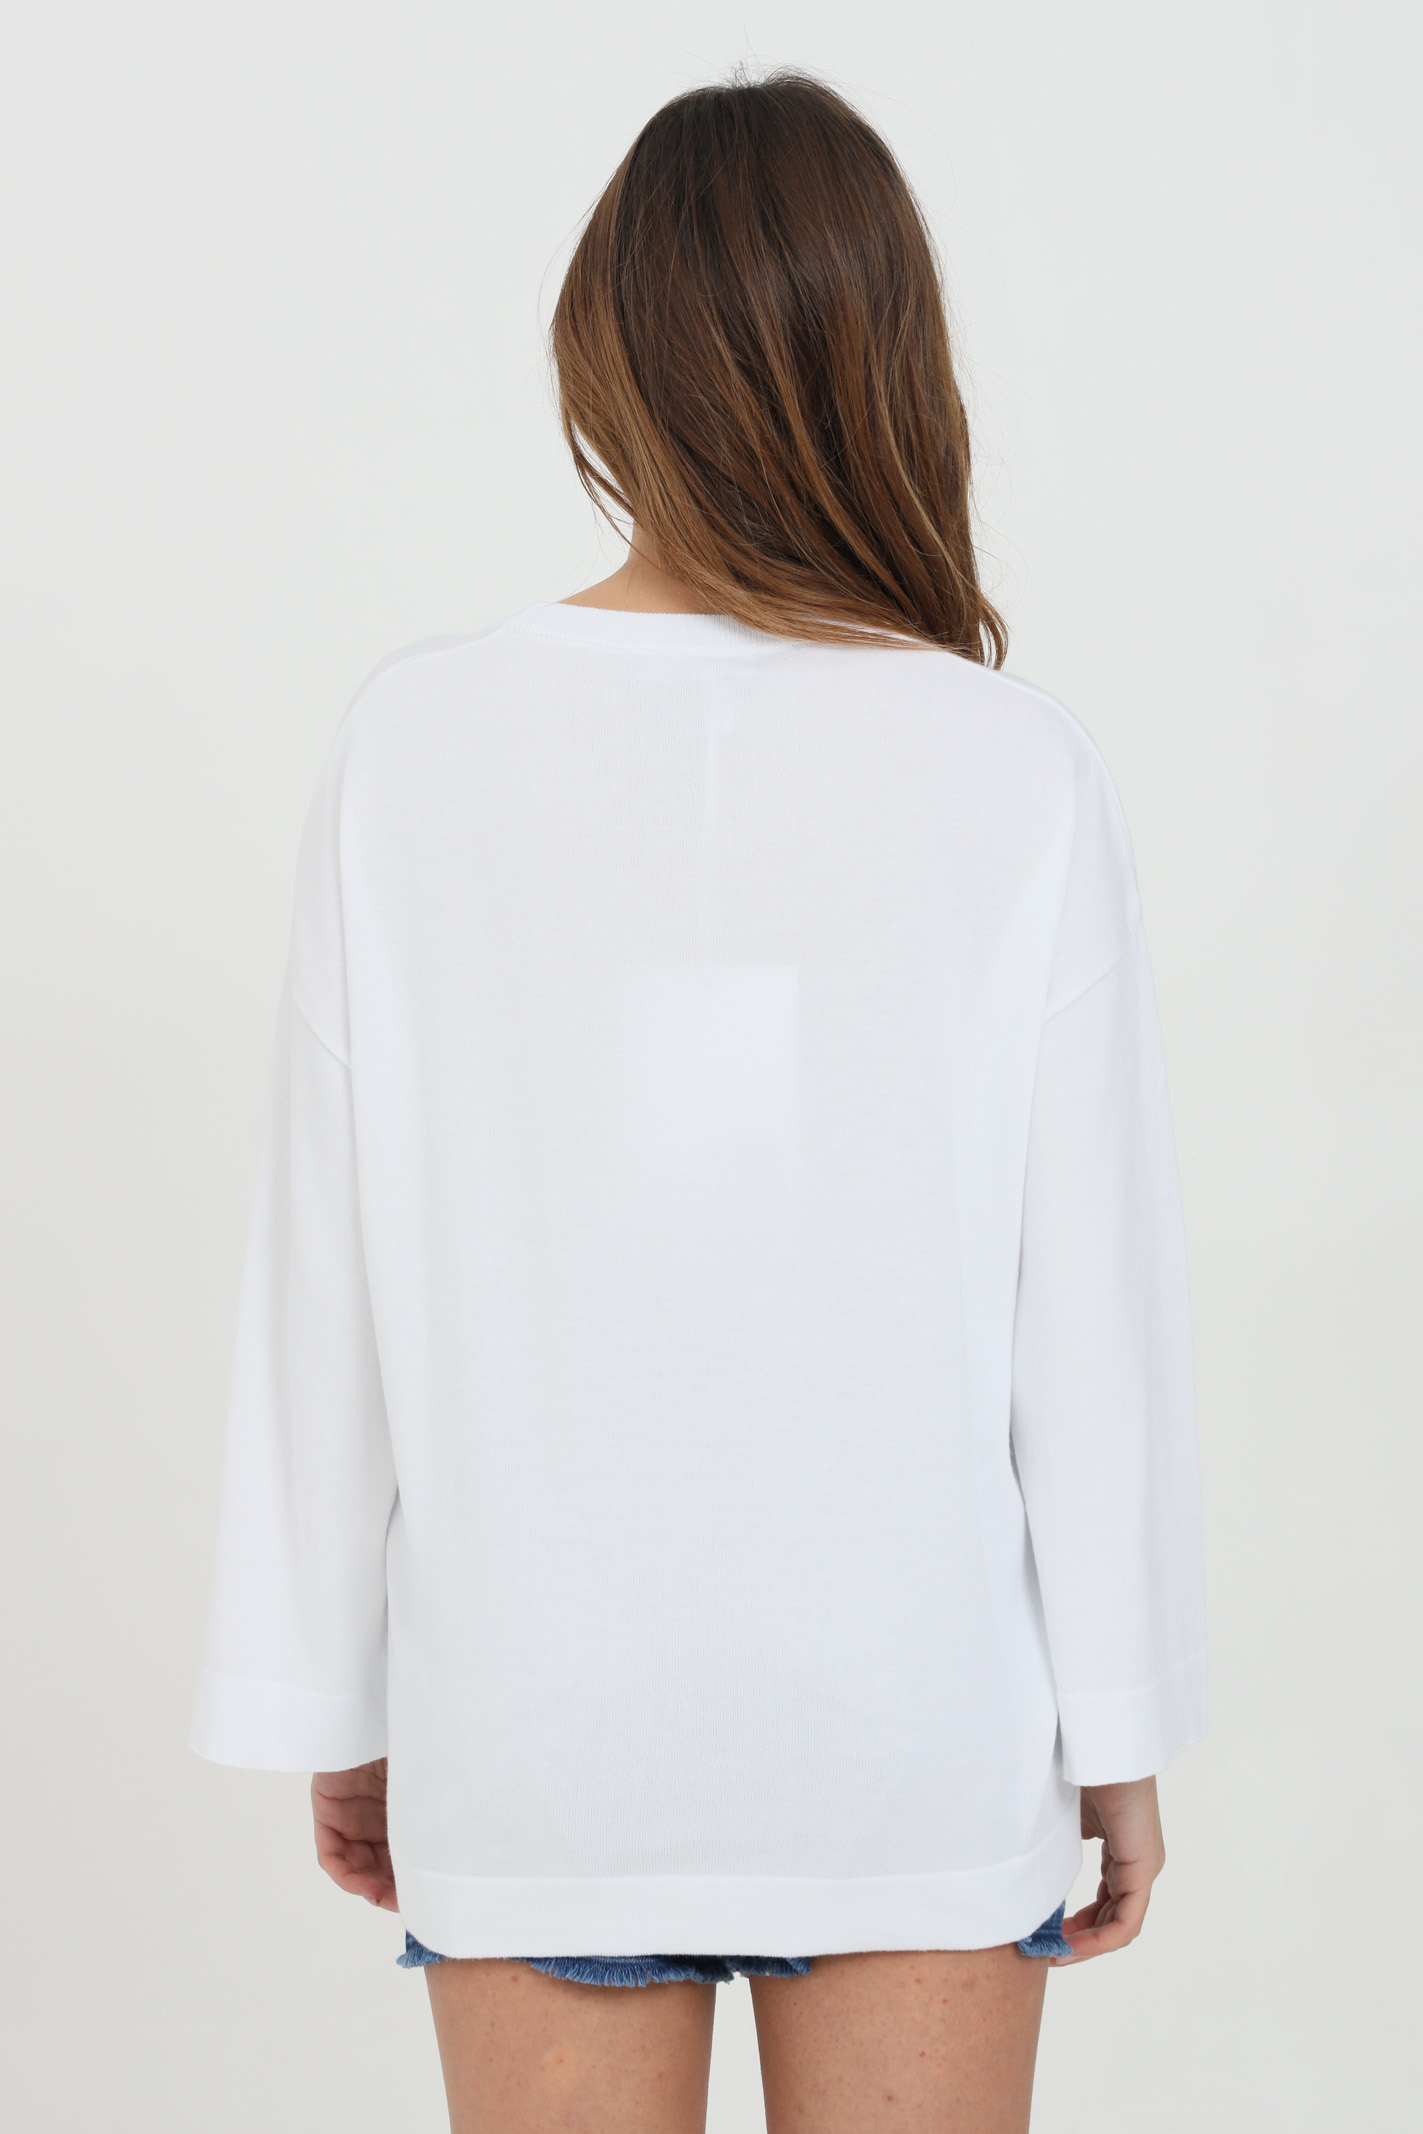 Felpa donna bianco love moschino girocollo con logo multicolor frontale. Manica a fondo ampio. Modello comodo LOVE MOSCHINO   Felpe   WS62G11X0985A00